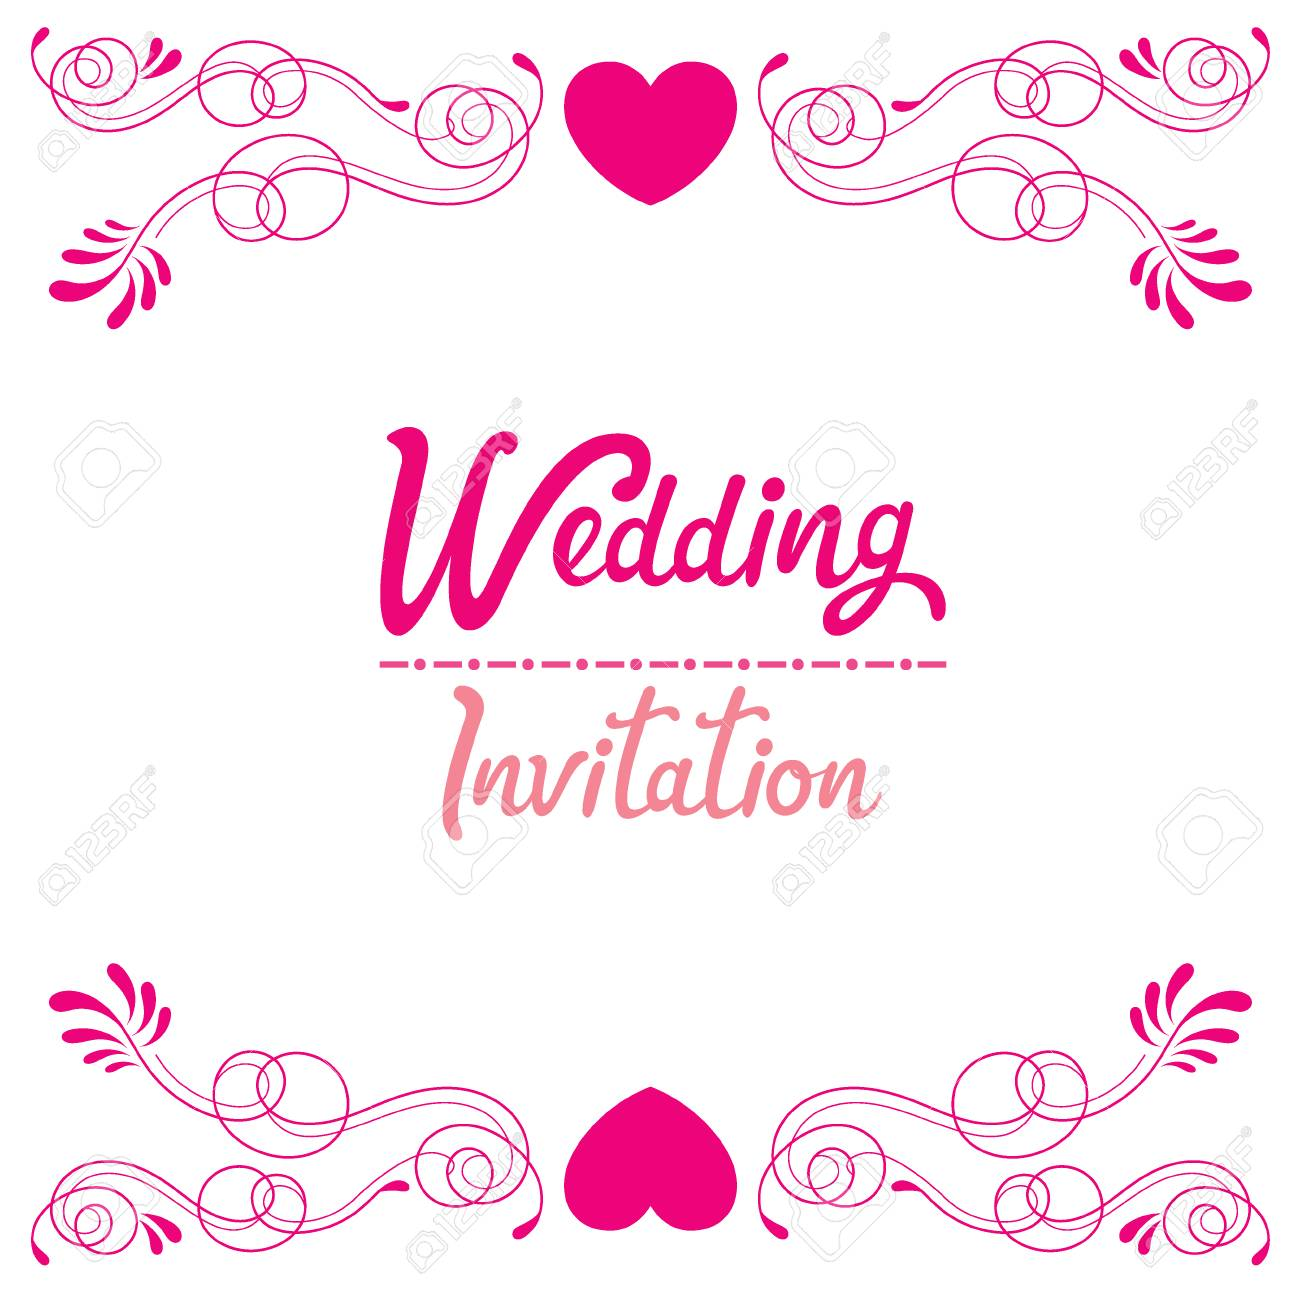 Wedding invitation card love relationship floral engagement wedding invitation card love relationship floral engagement valentines day banco de stopboris Choice Image